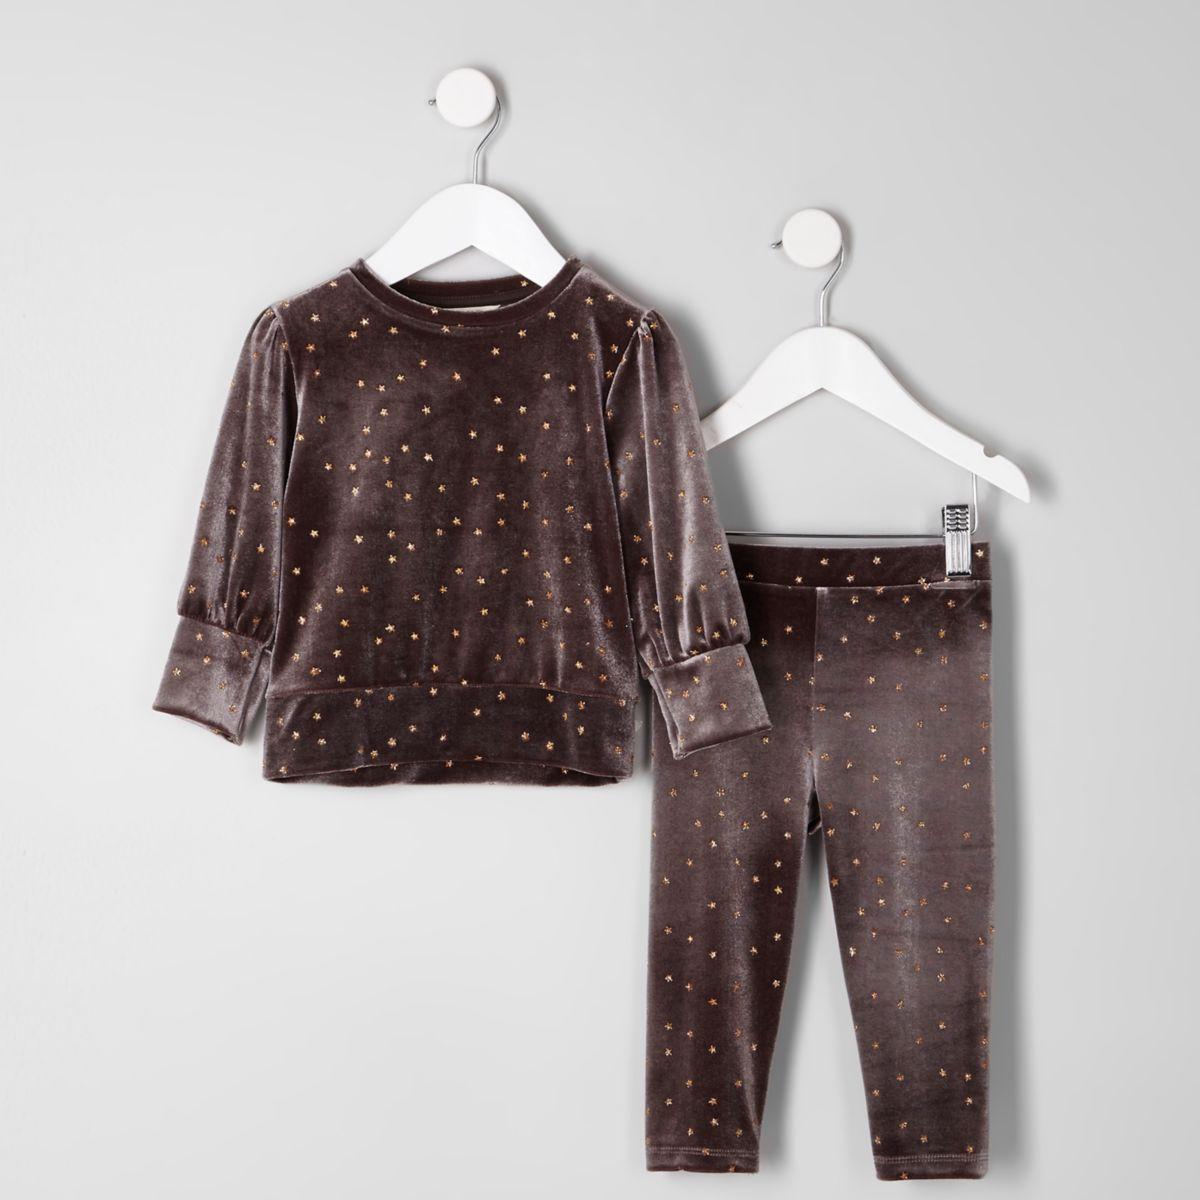 Mini girls grey velour star sweatshirt outfit